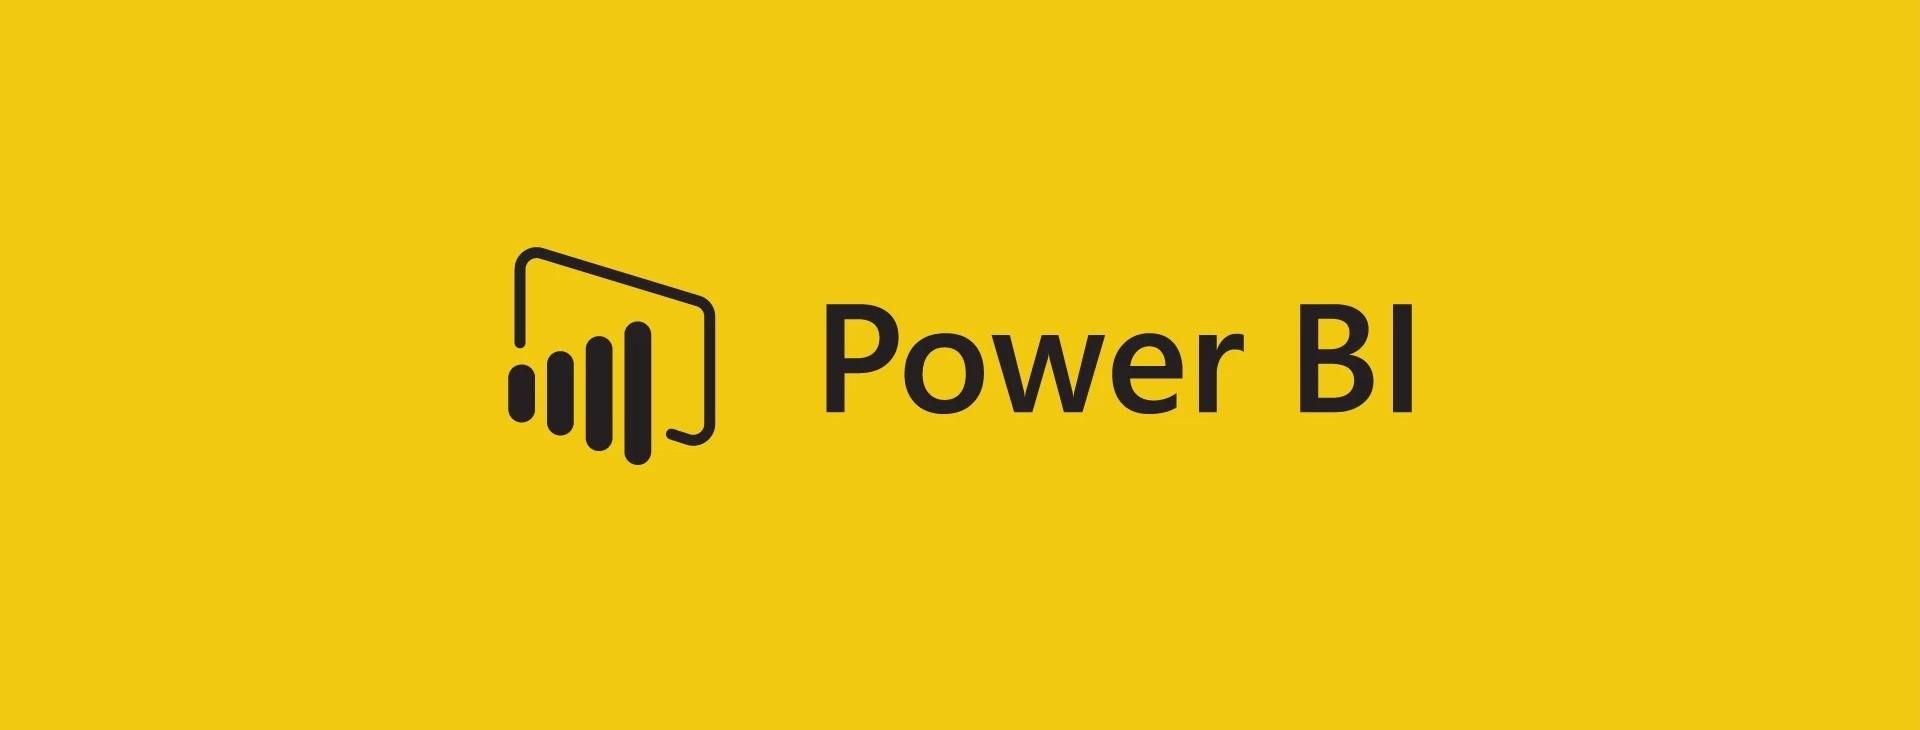 Power BI Desktop and Power BI Server March 2018 Updates